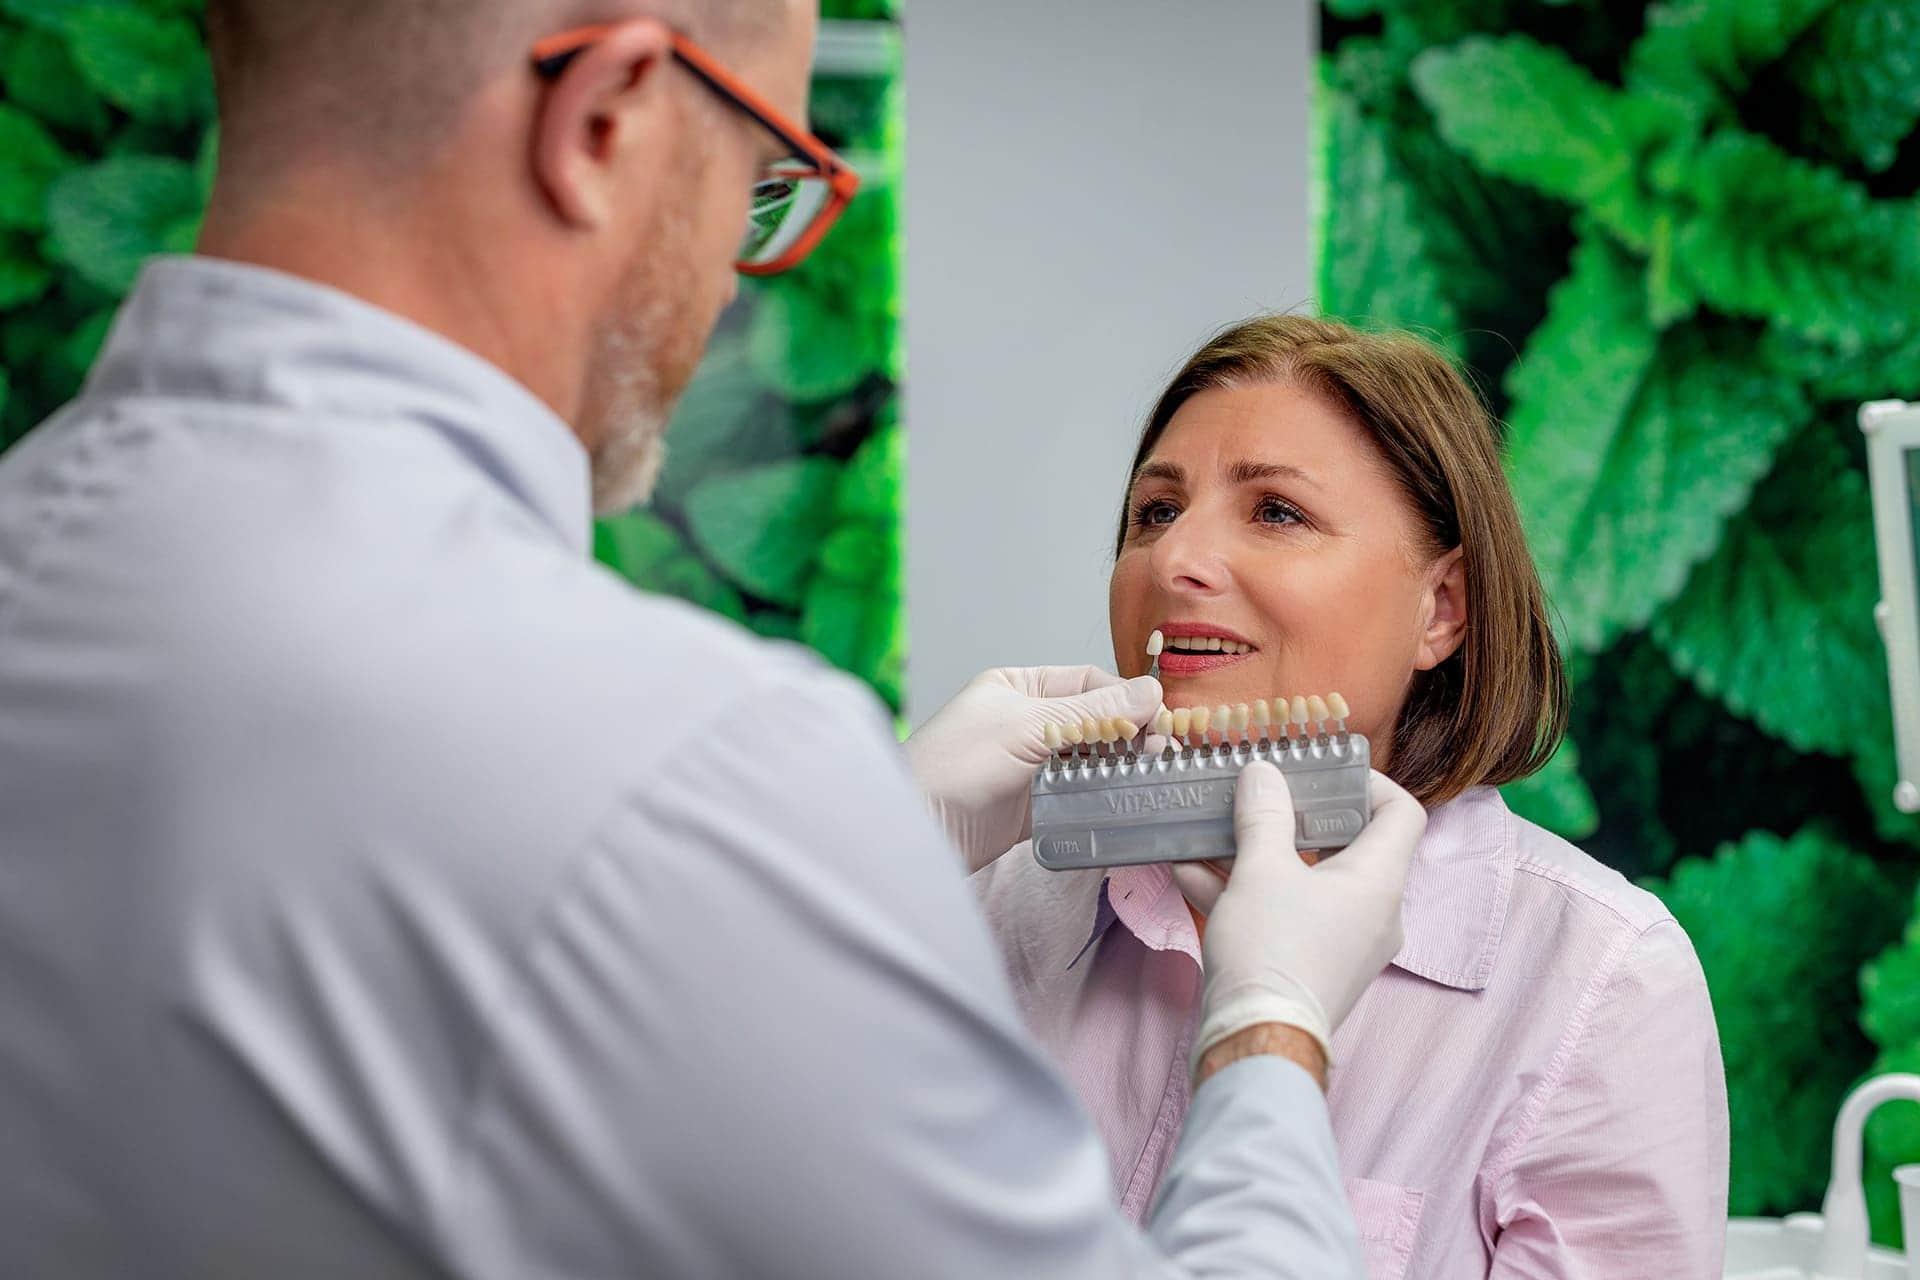 Proteza naimplantach - dr Jadczyk